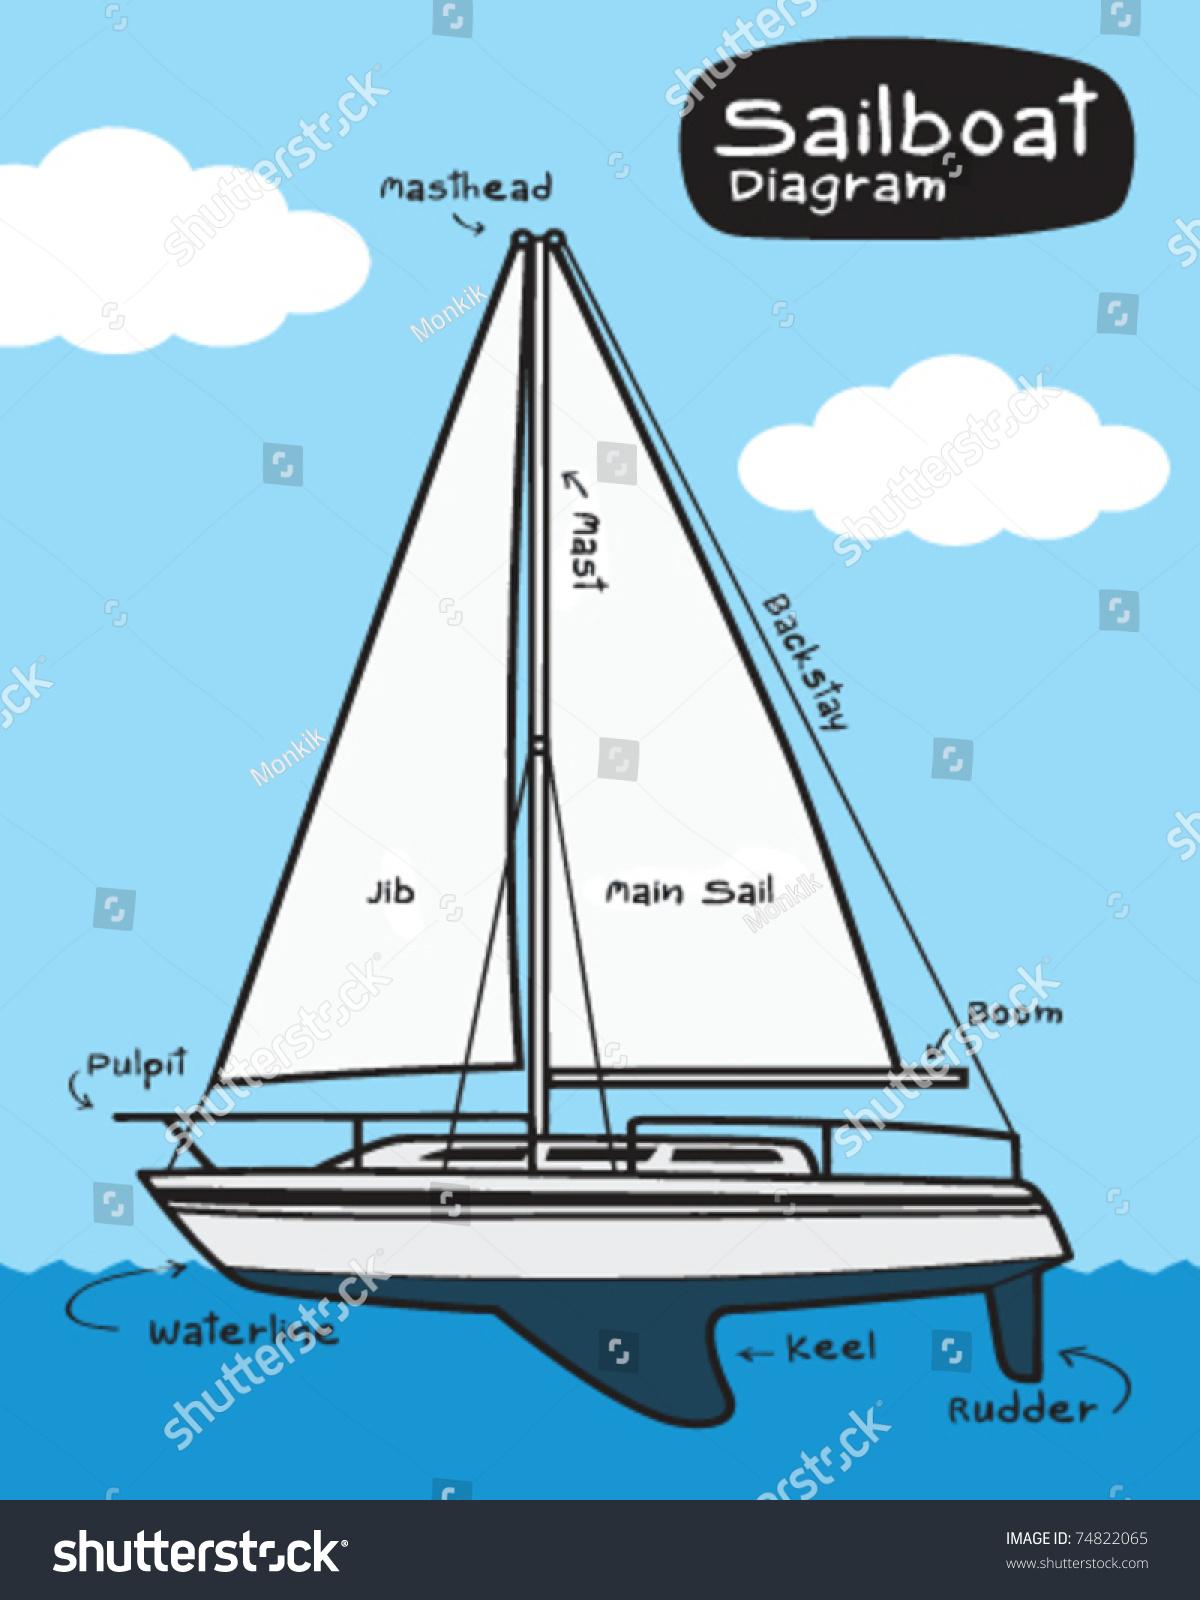 Sailboat Diagram Stock Vector 74822065